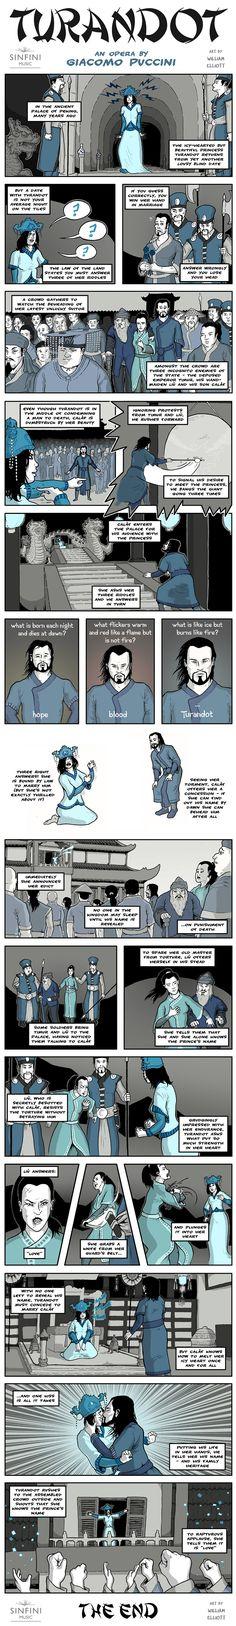 Turandot: An Opera by Giacomo Puccini. Opera Comic Strip Art by William Elliott